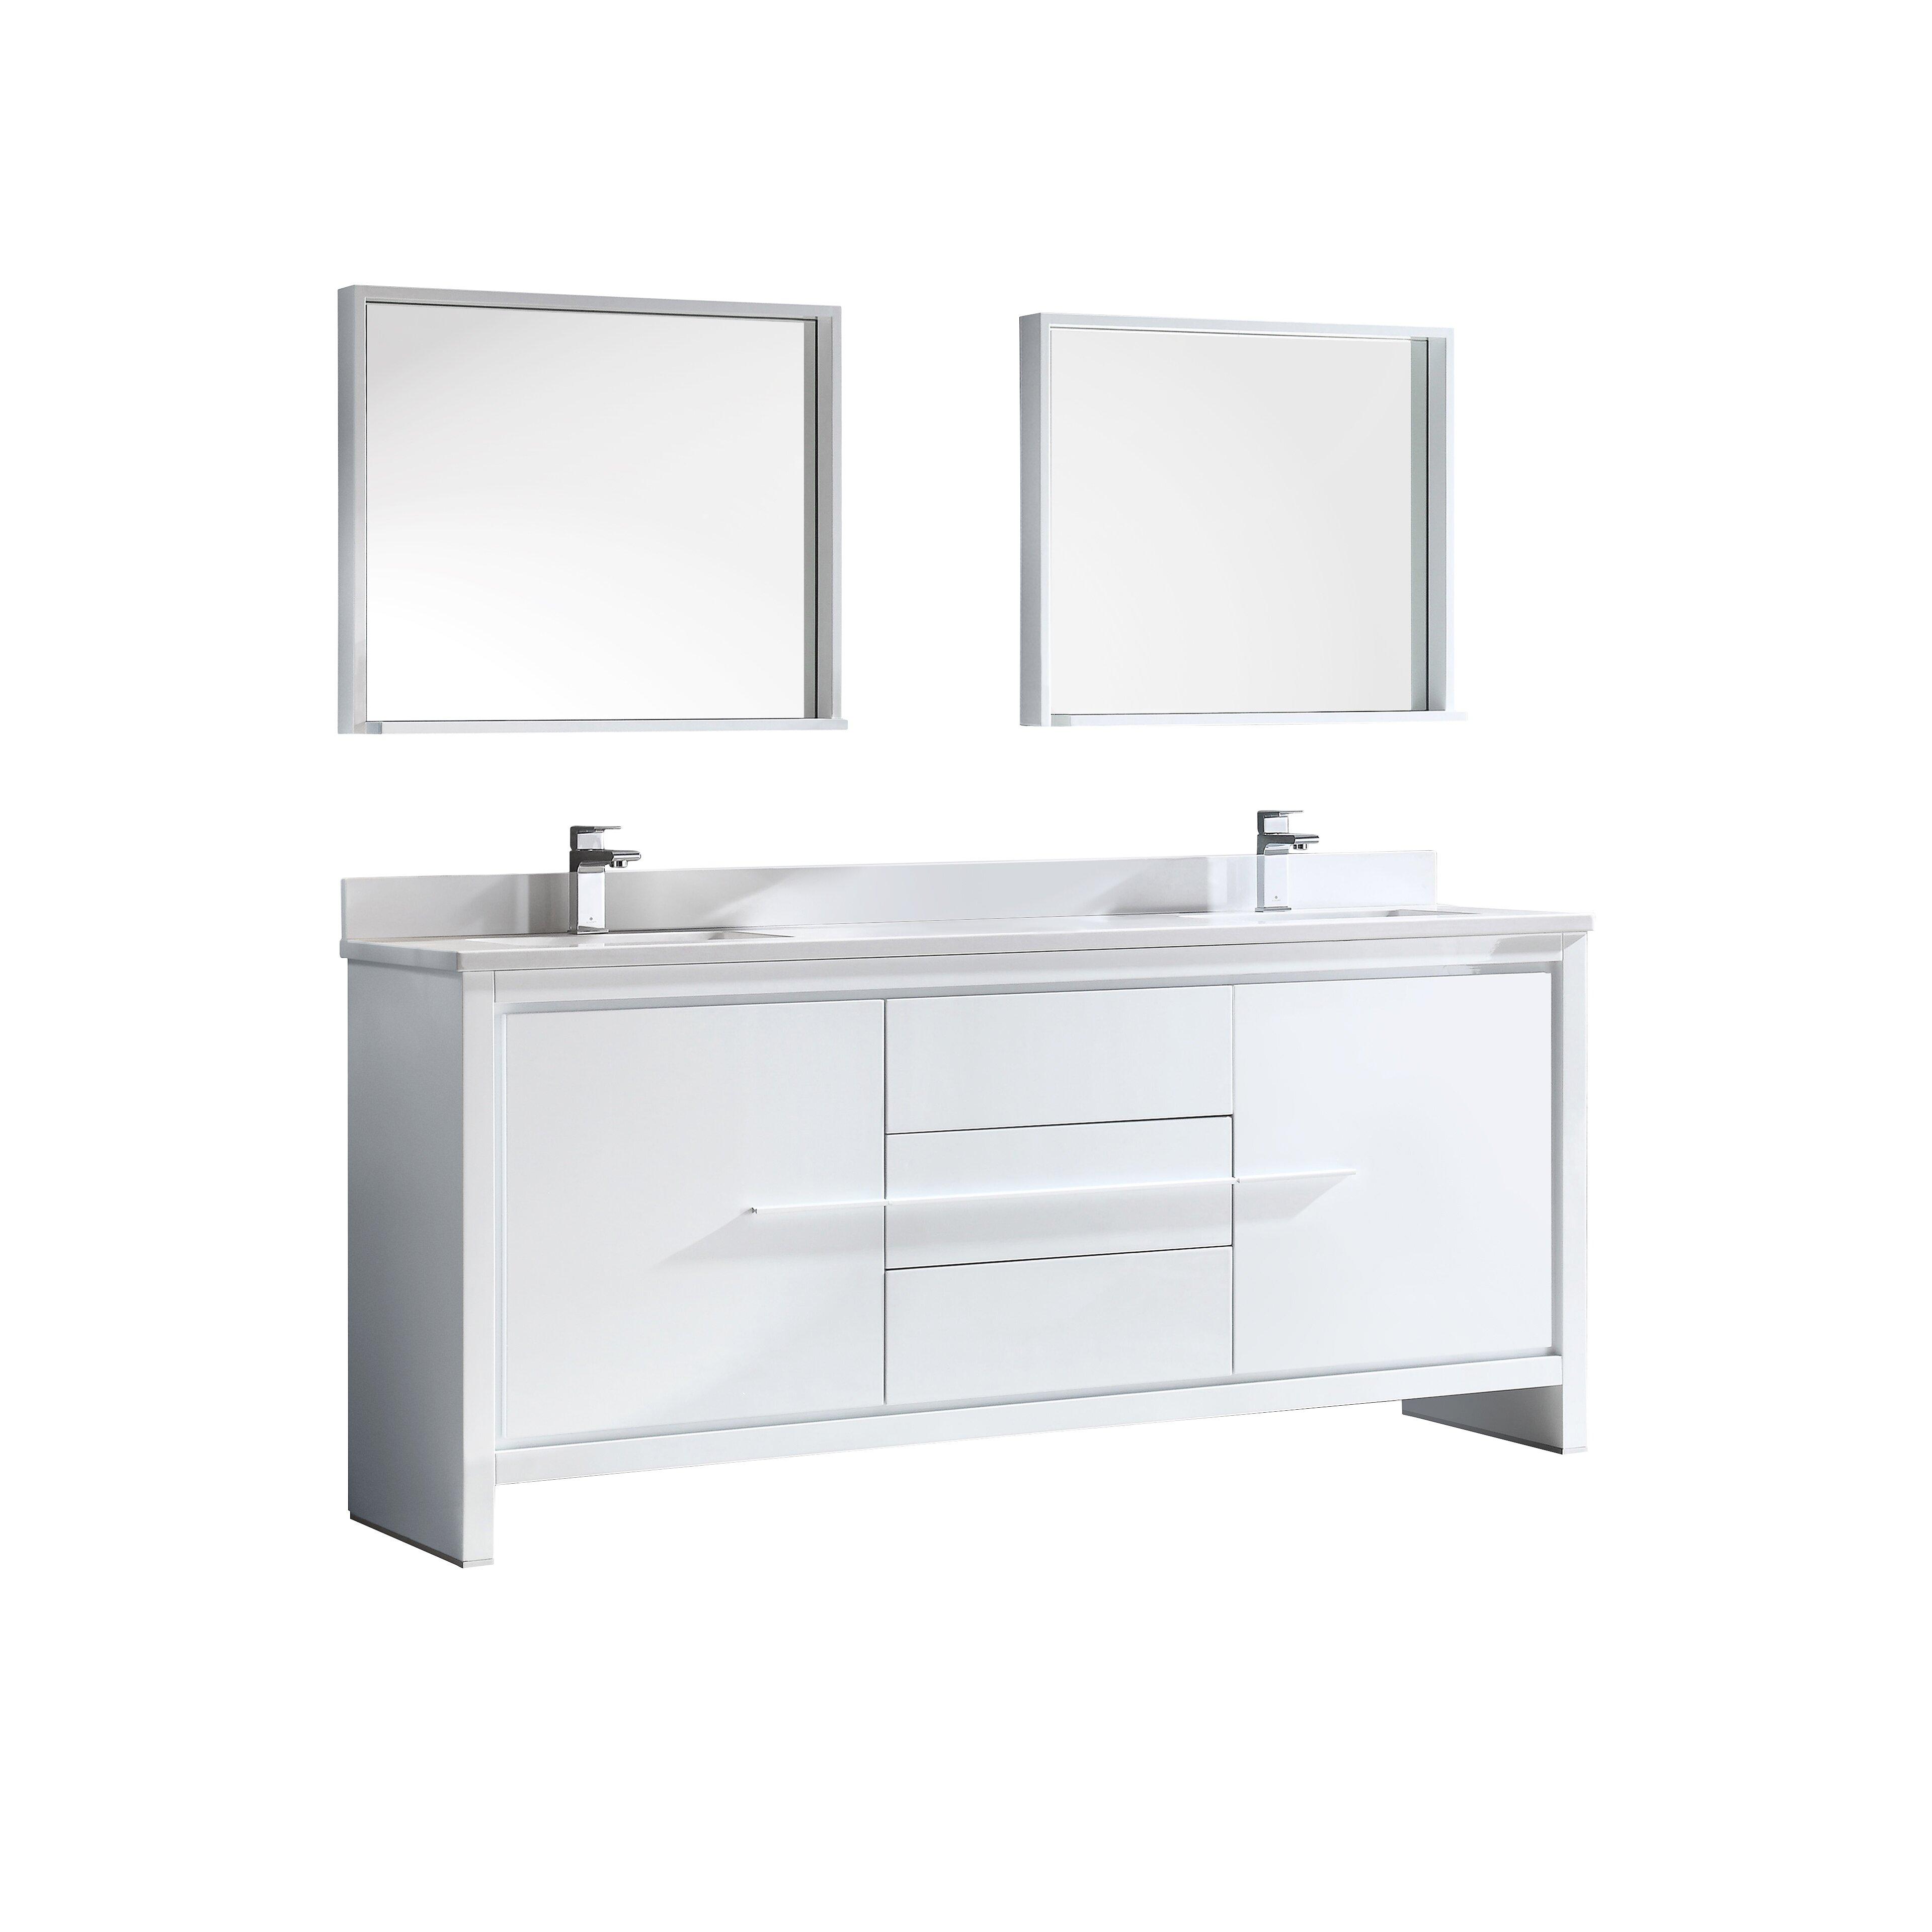 "Double Sink Mirrored Bathroom Vanity: Fresca Trieste Allier 72"" Double Modern Sink Bathroom"